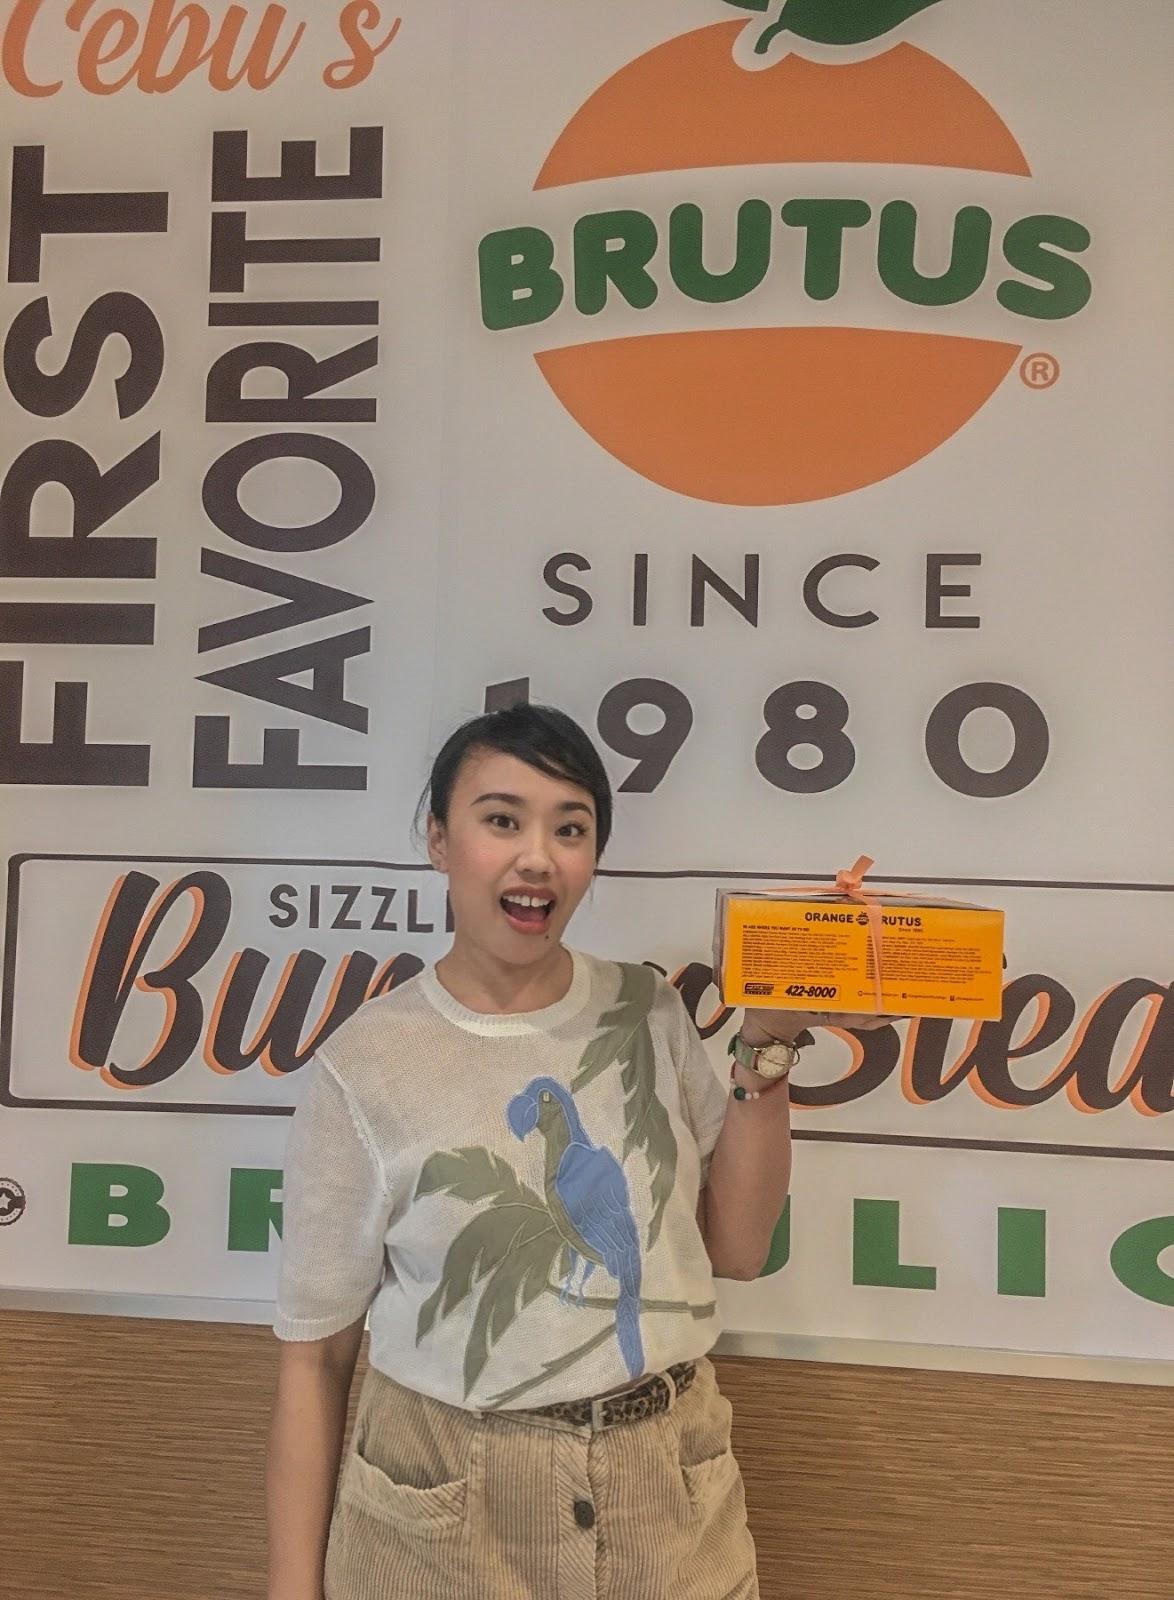 Orange Brutus Cebu Blogger